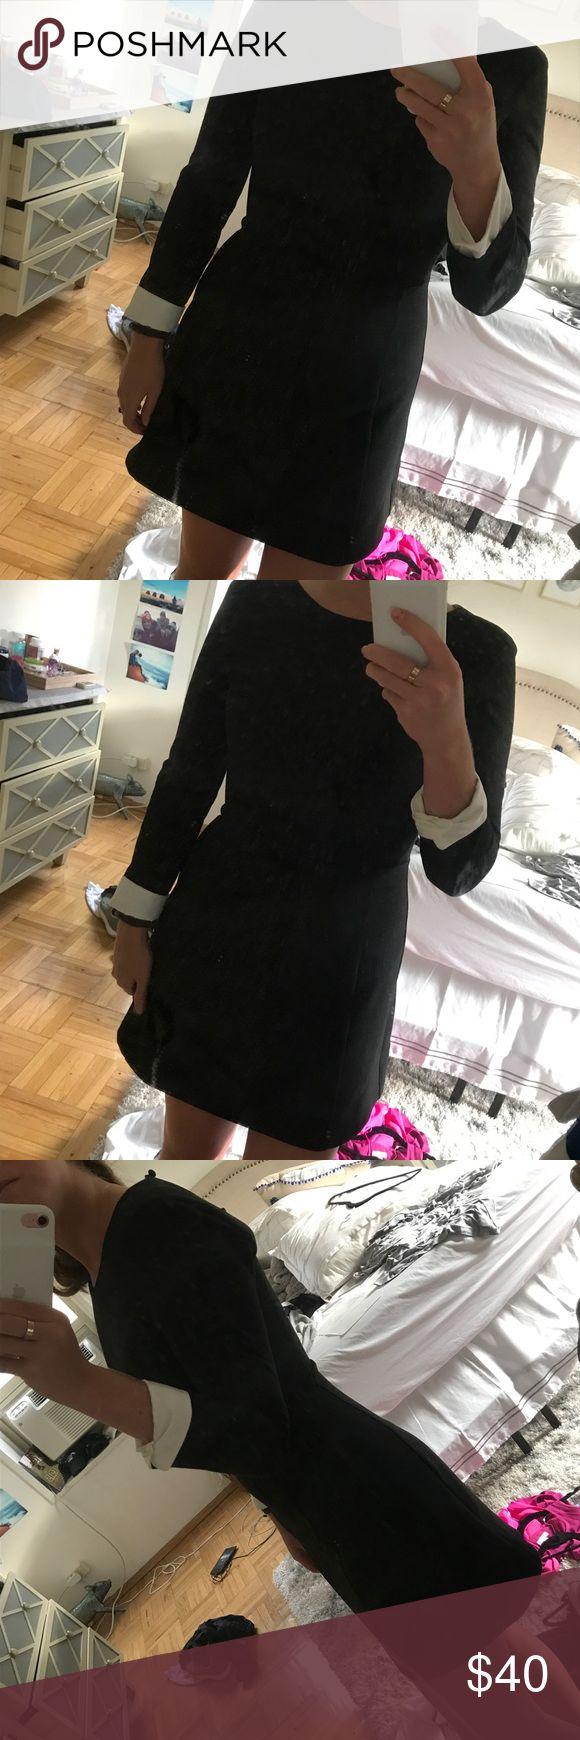 Zara black dress- medium Black dress from Zara- super cute! White cuffs, 3/4 sleeves. Zara Dresses